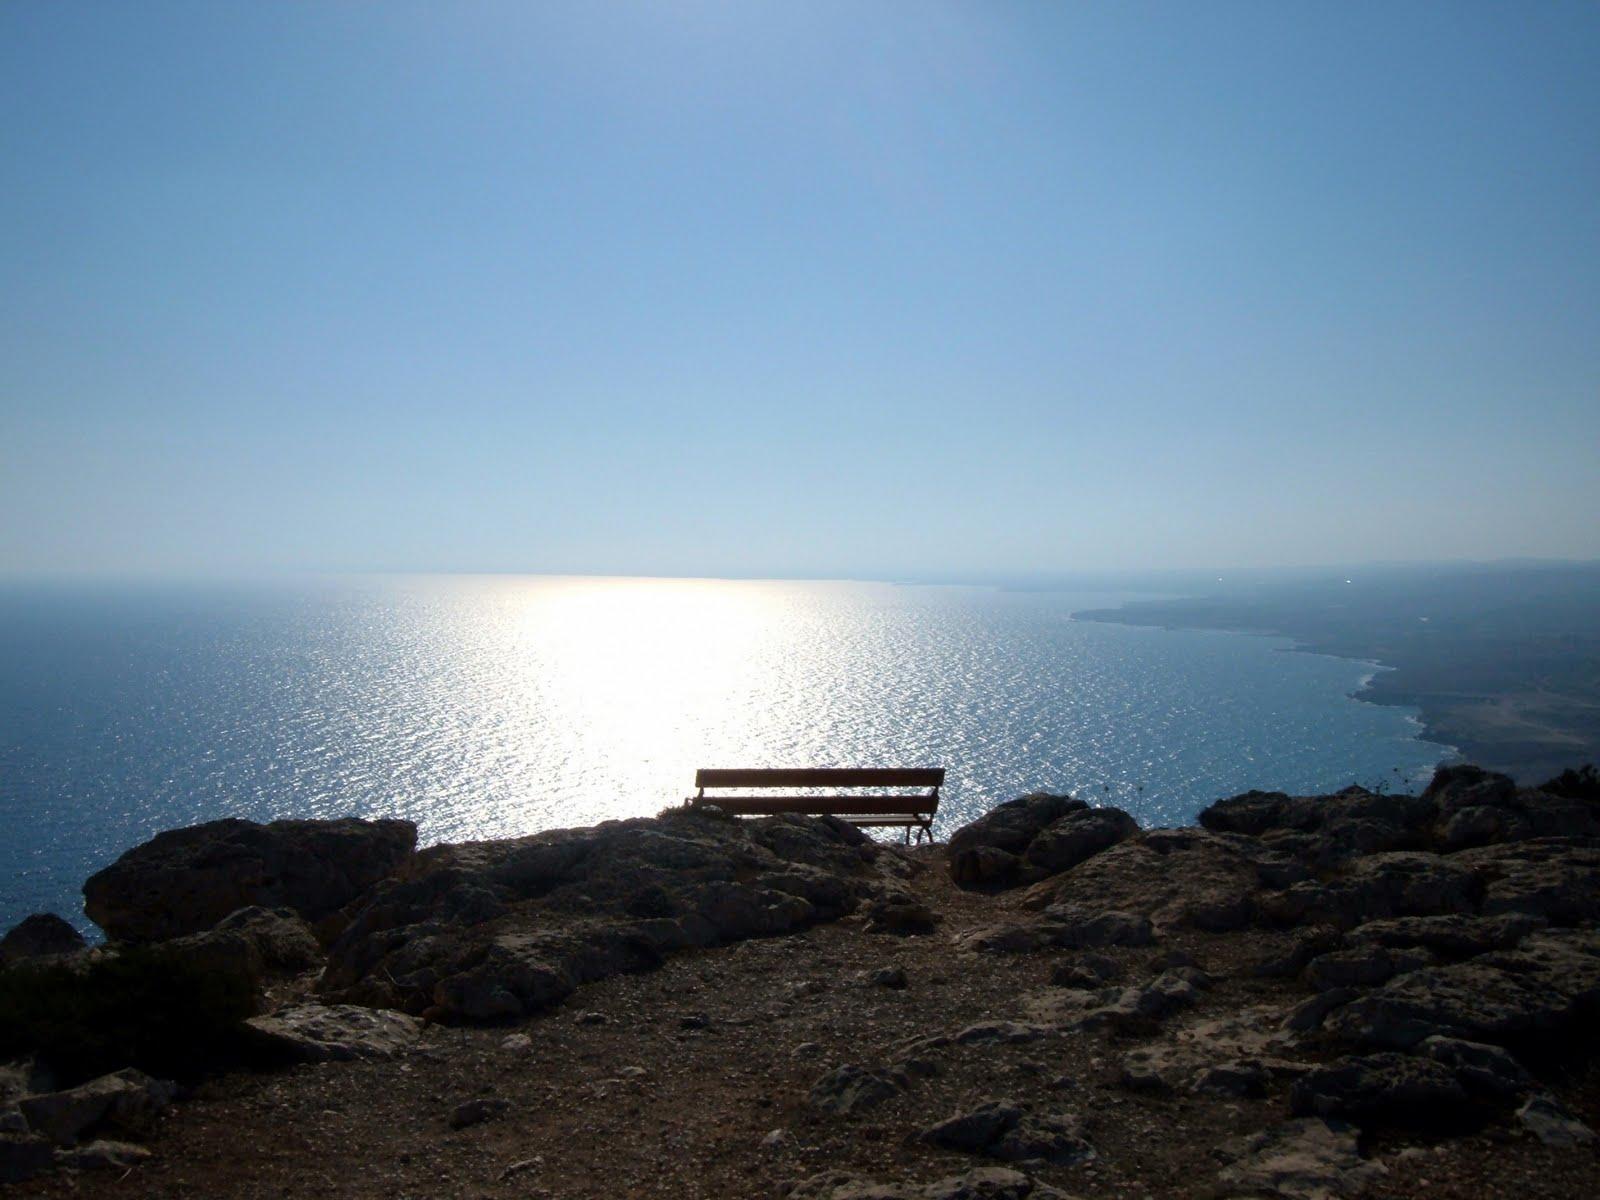 http://1.bp.blogspot.com/-VQSZ8su5YSI/TZXB24d32WI/AAAAAAAABoY/gtRBsGx9cVQ/s1600/hill_ocean_view-1920x1440.jpg